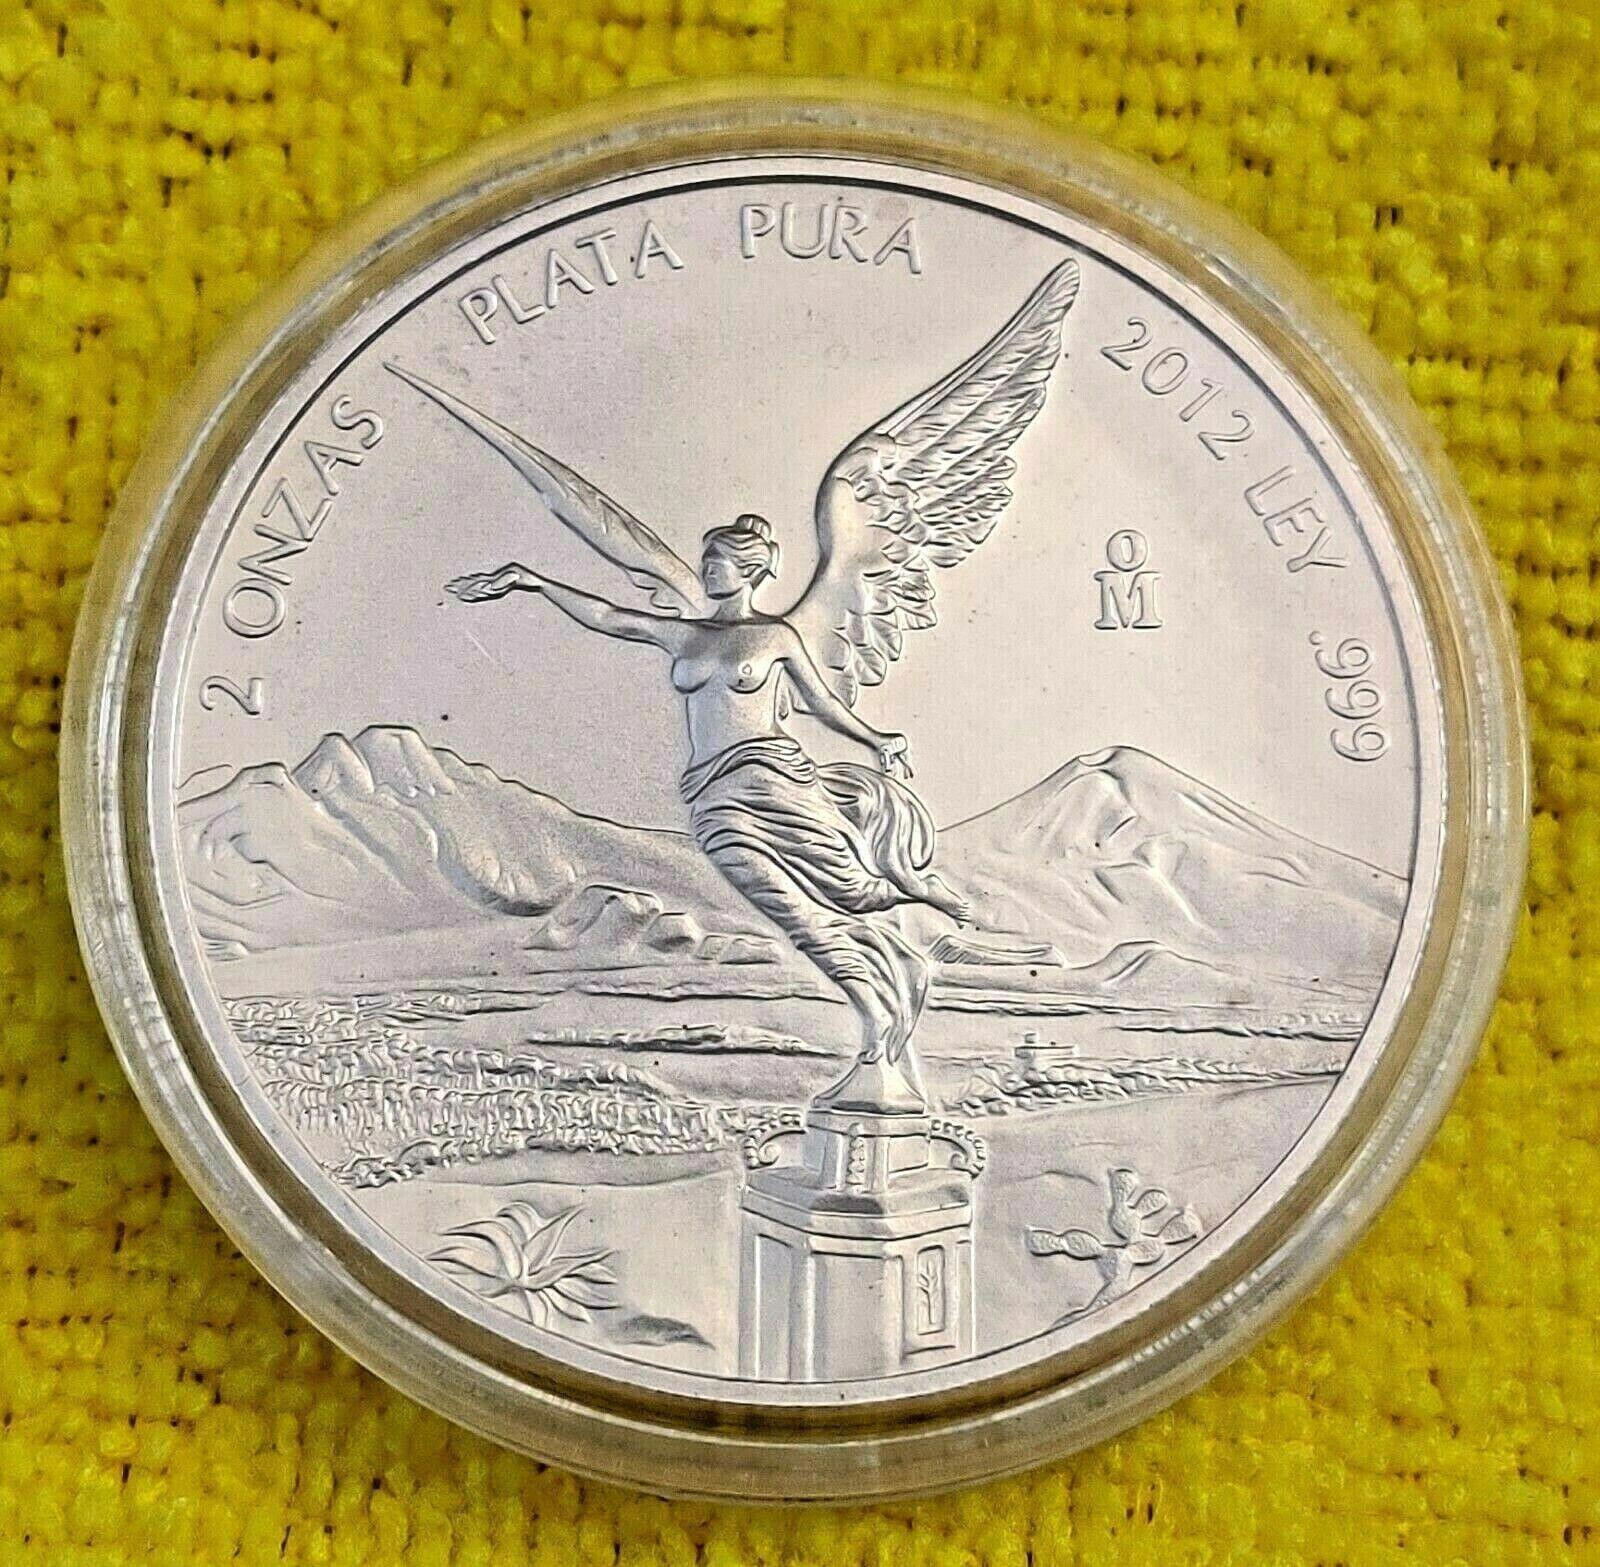 400 Oz Silver Bar In 2020 Silver Eagle Coins Silver Bars Bullion Coins